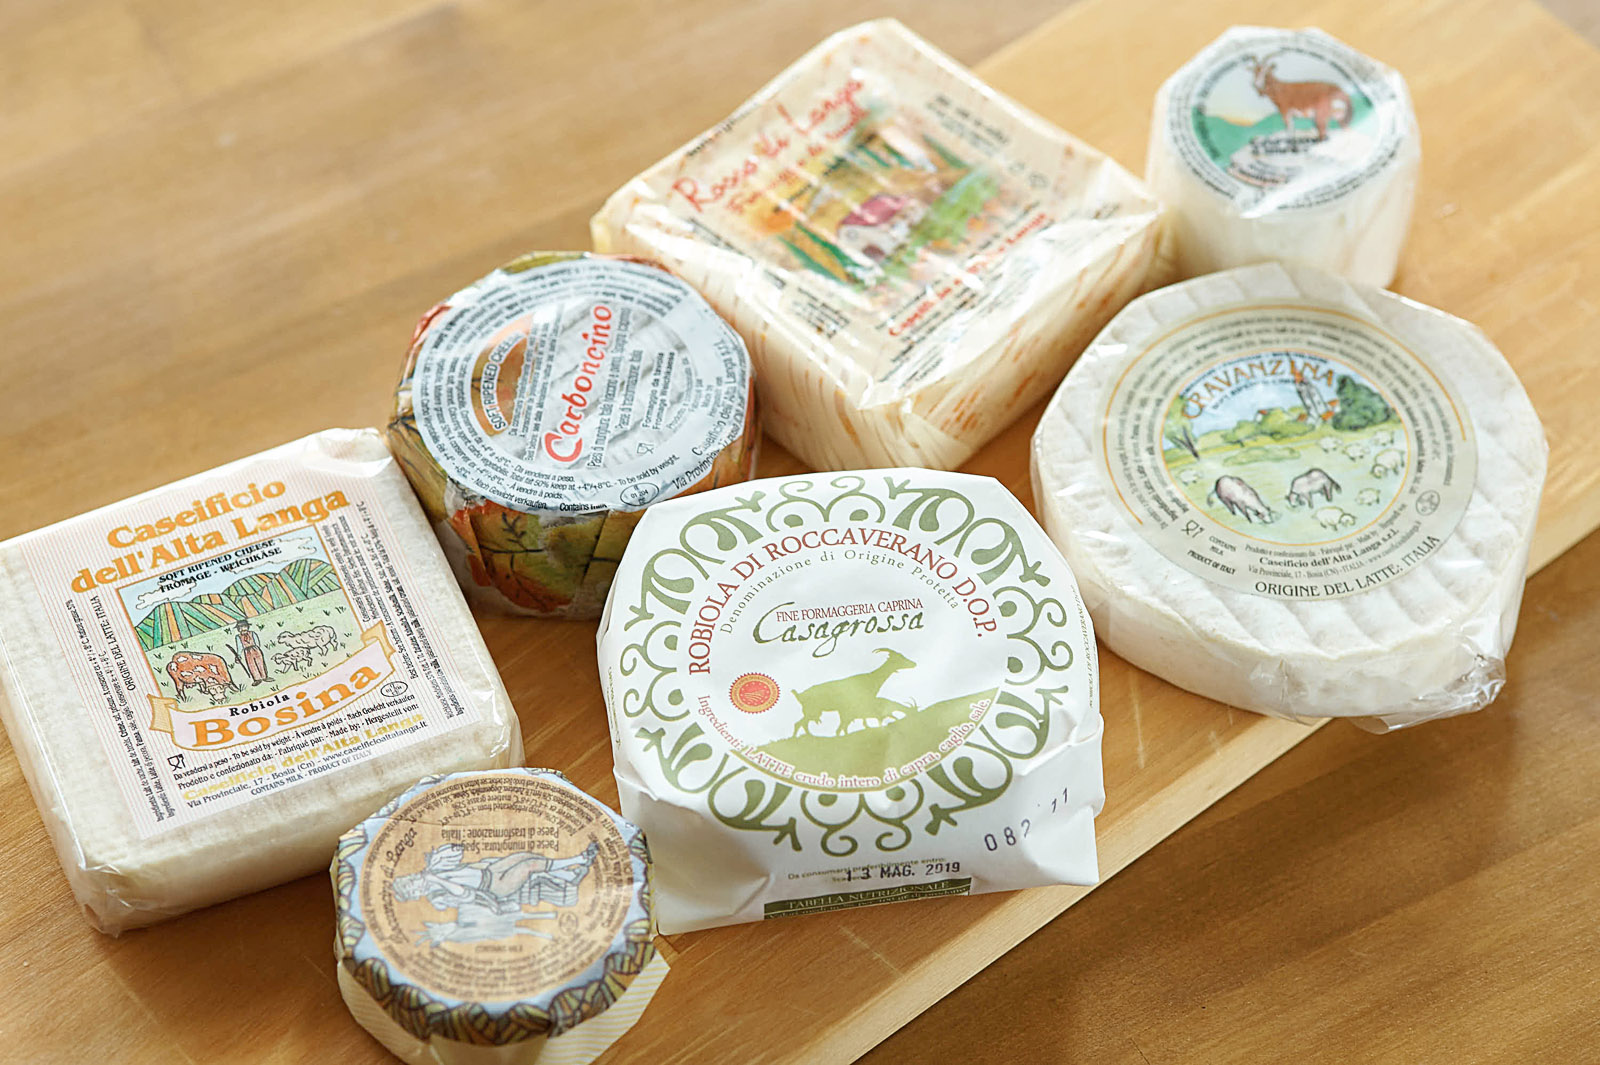 juusto piemonte